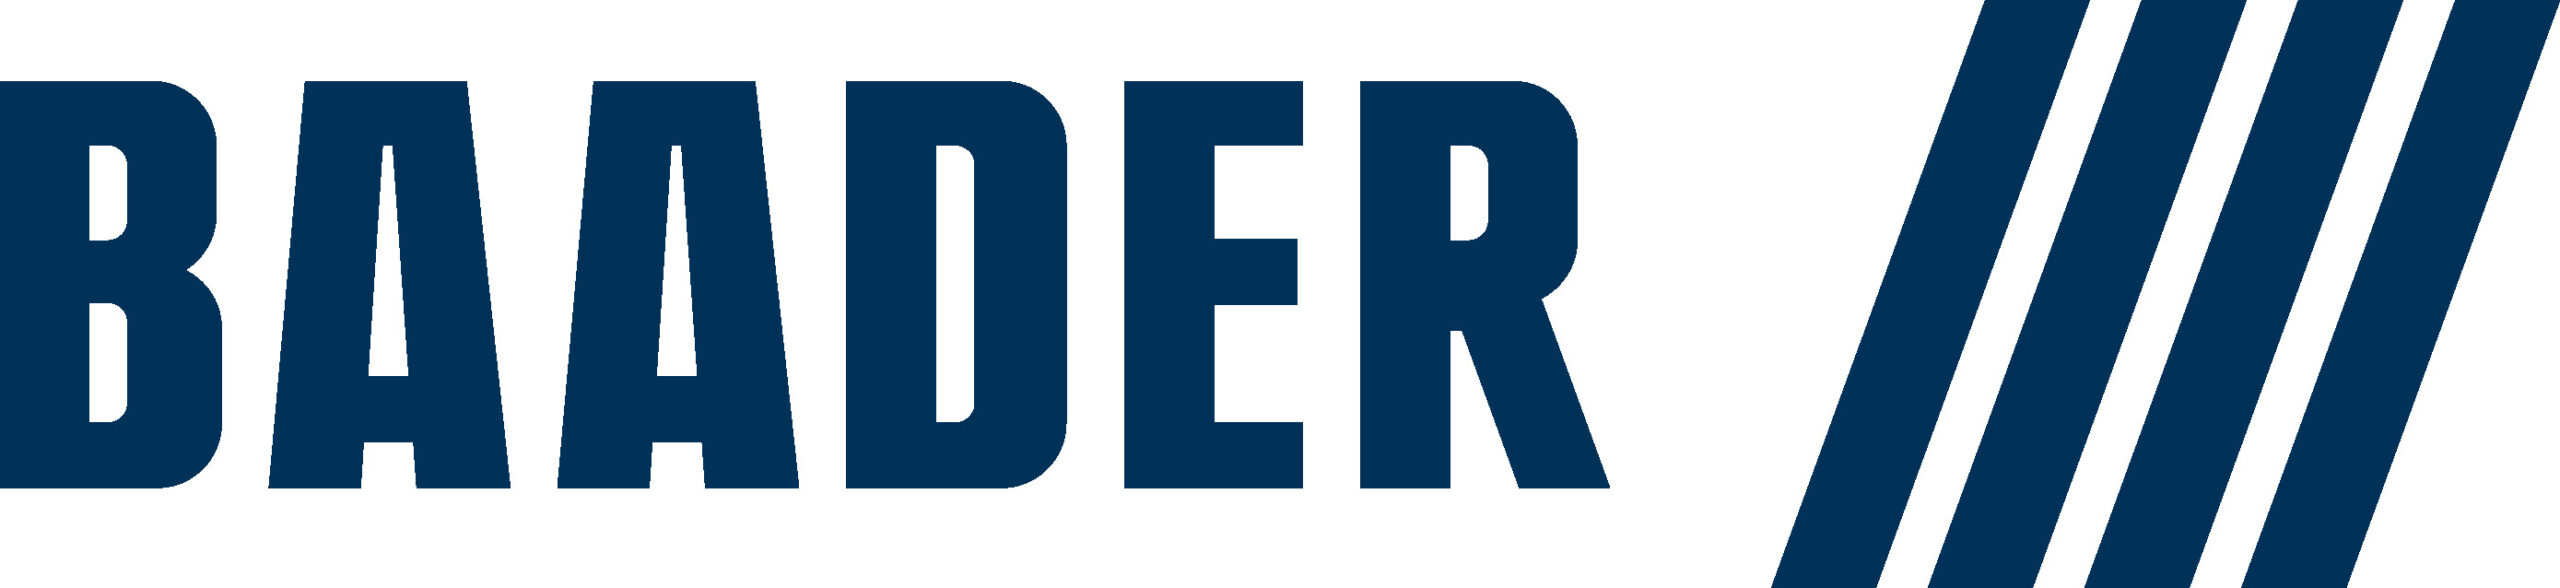 Logo_BAADER_sRGB_pos